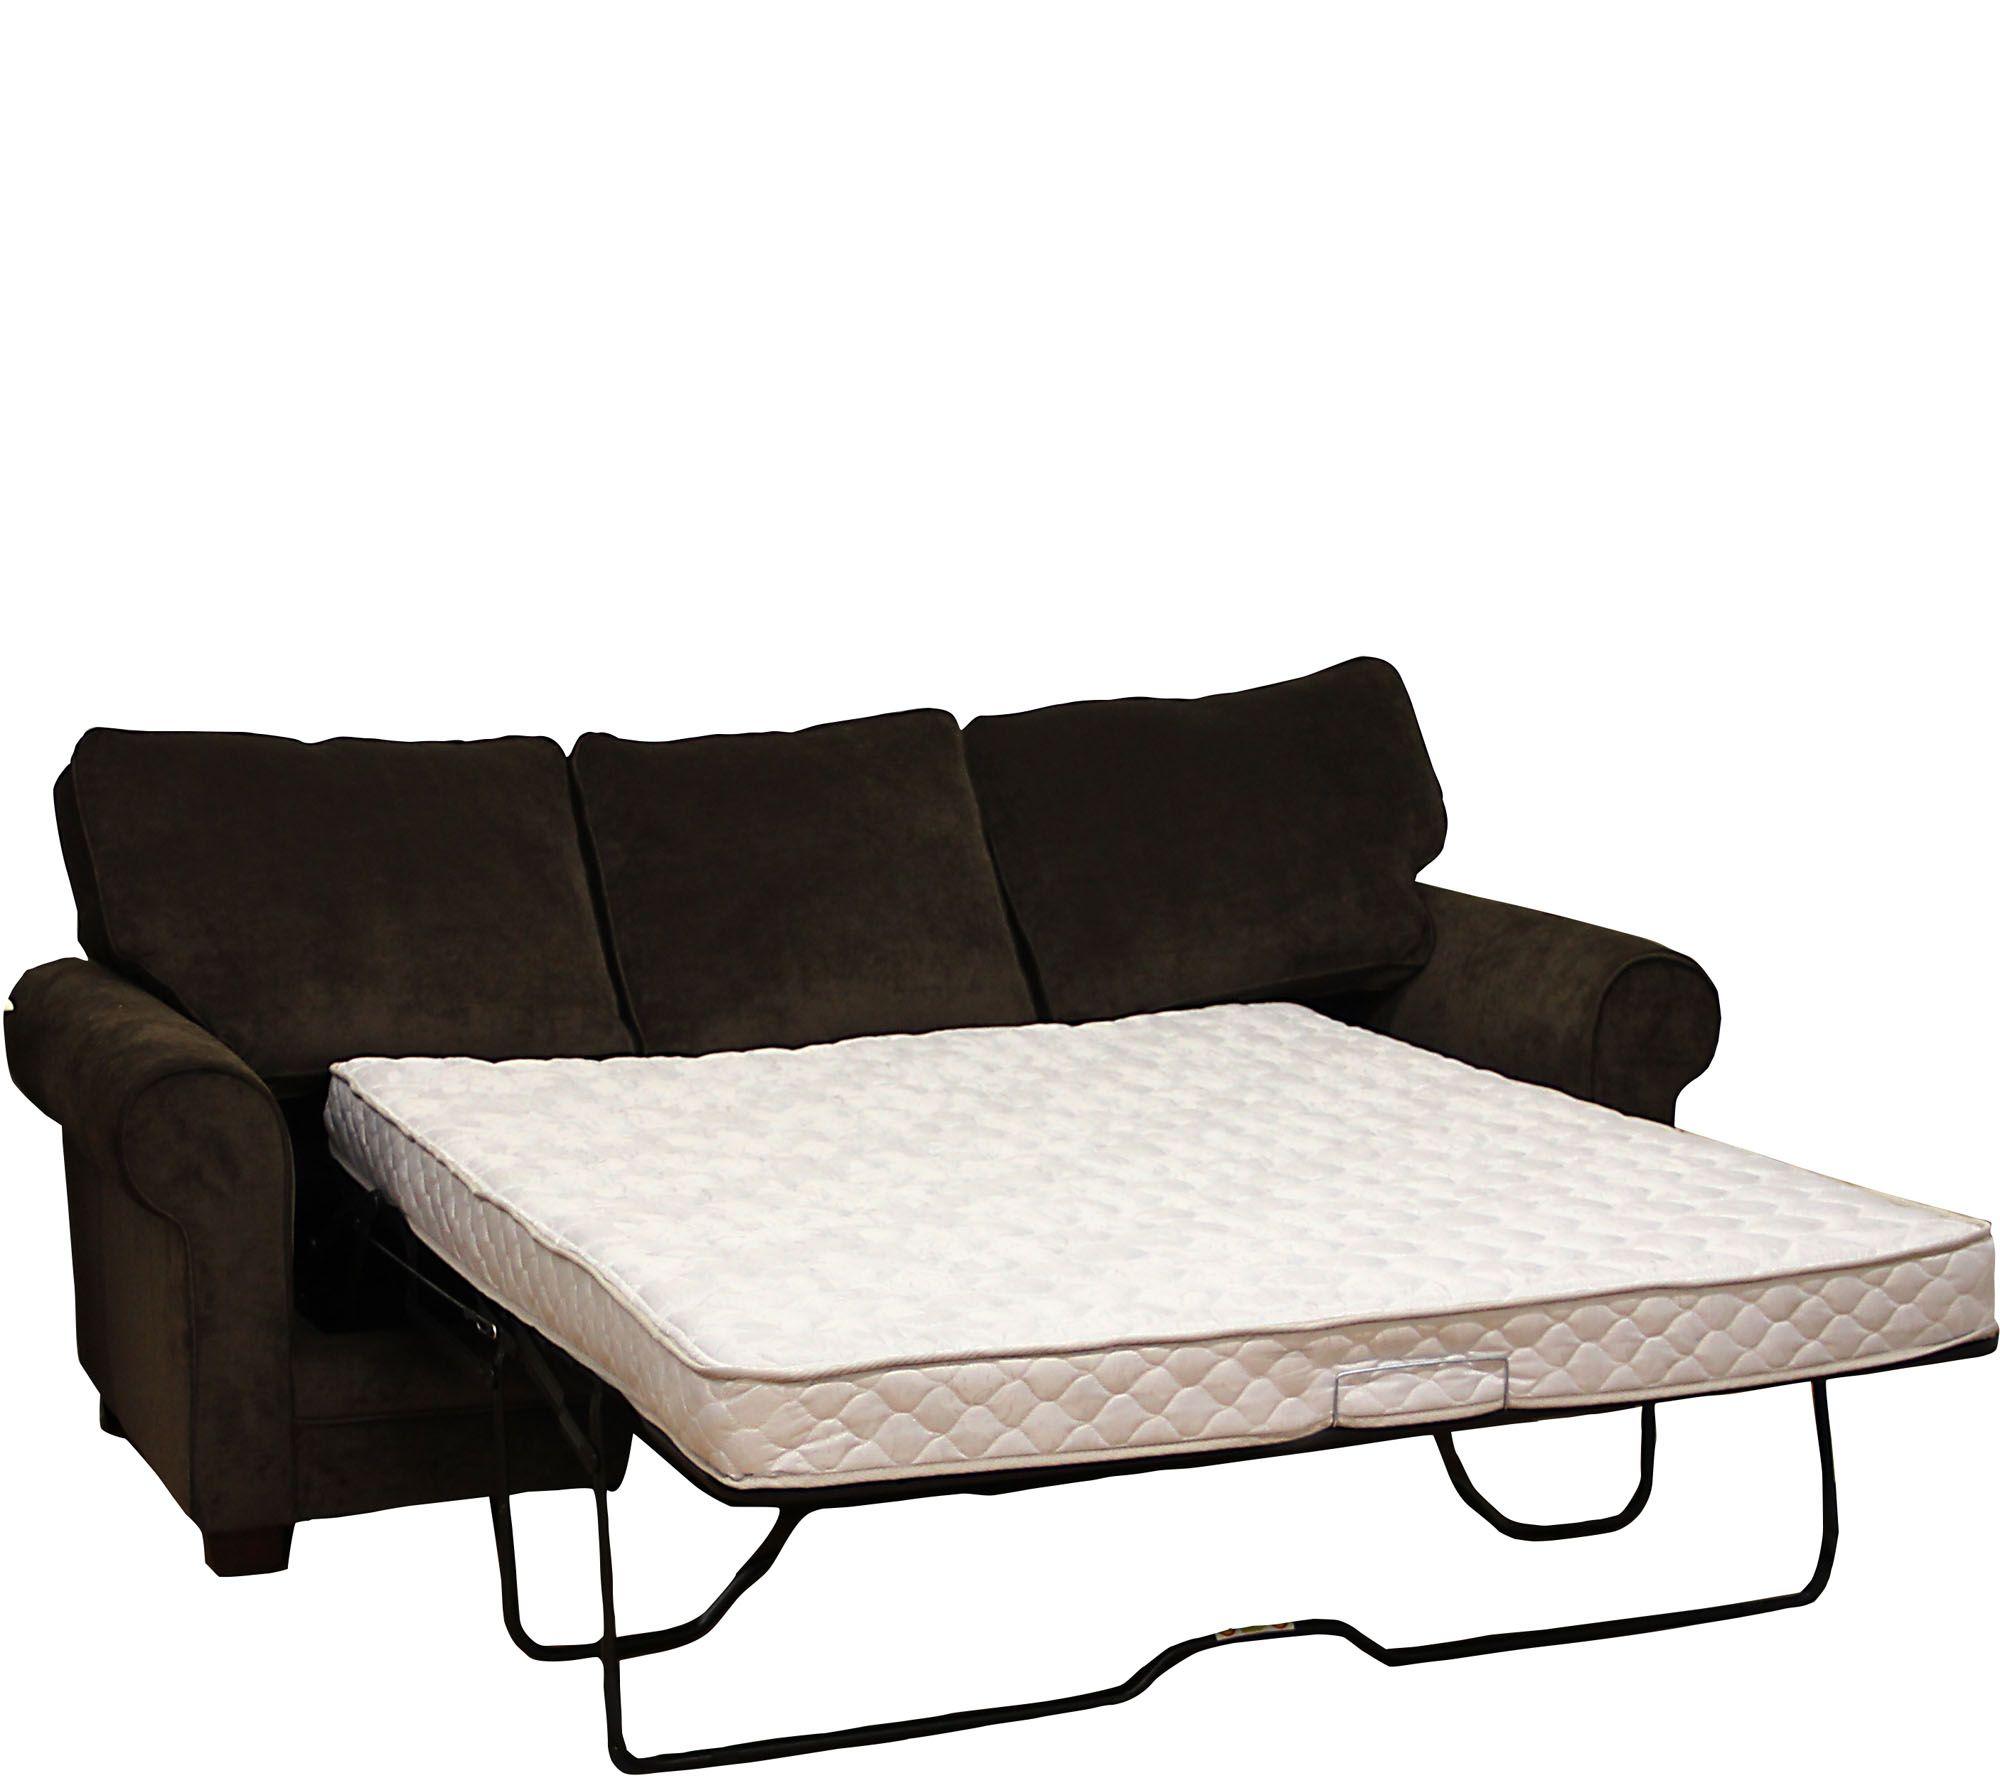 Pedicsolutions innerspring 5quot plush full sofa bed mattress for Qvc sofa bed